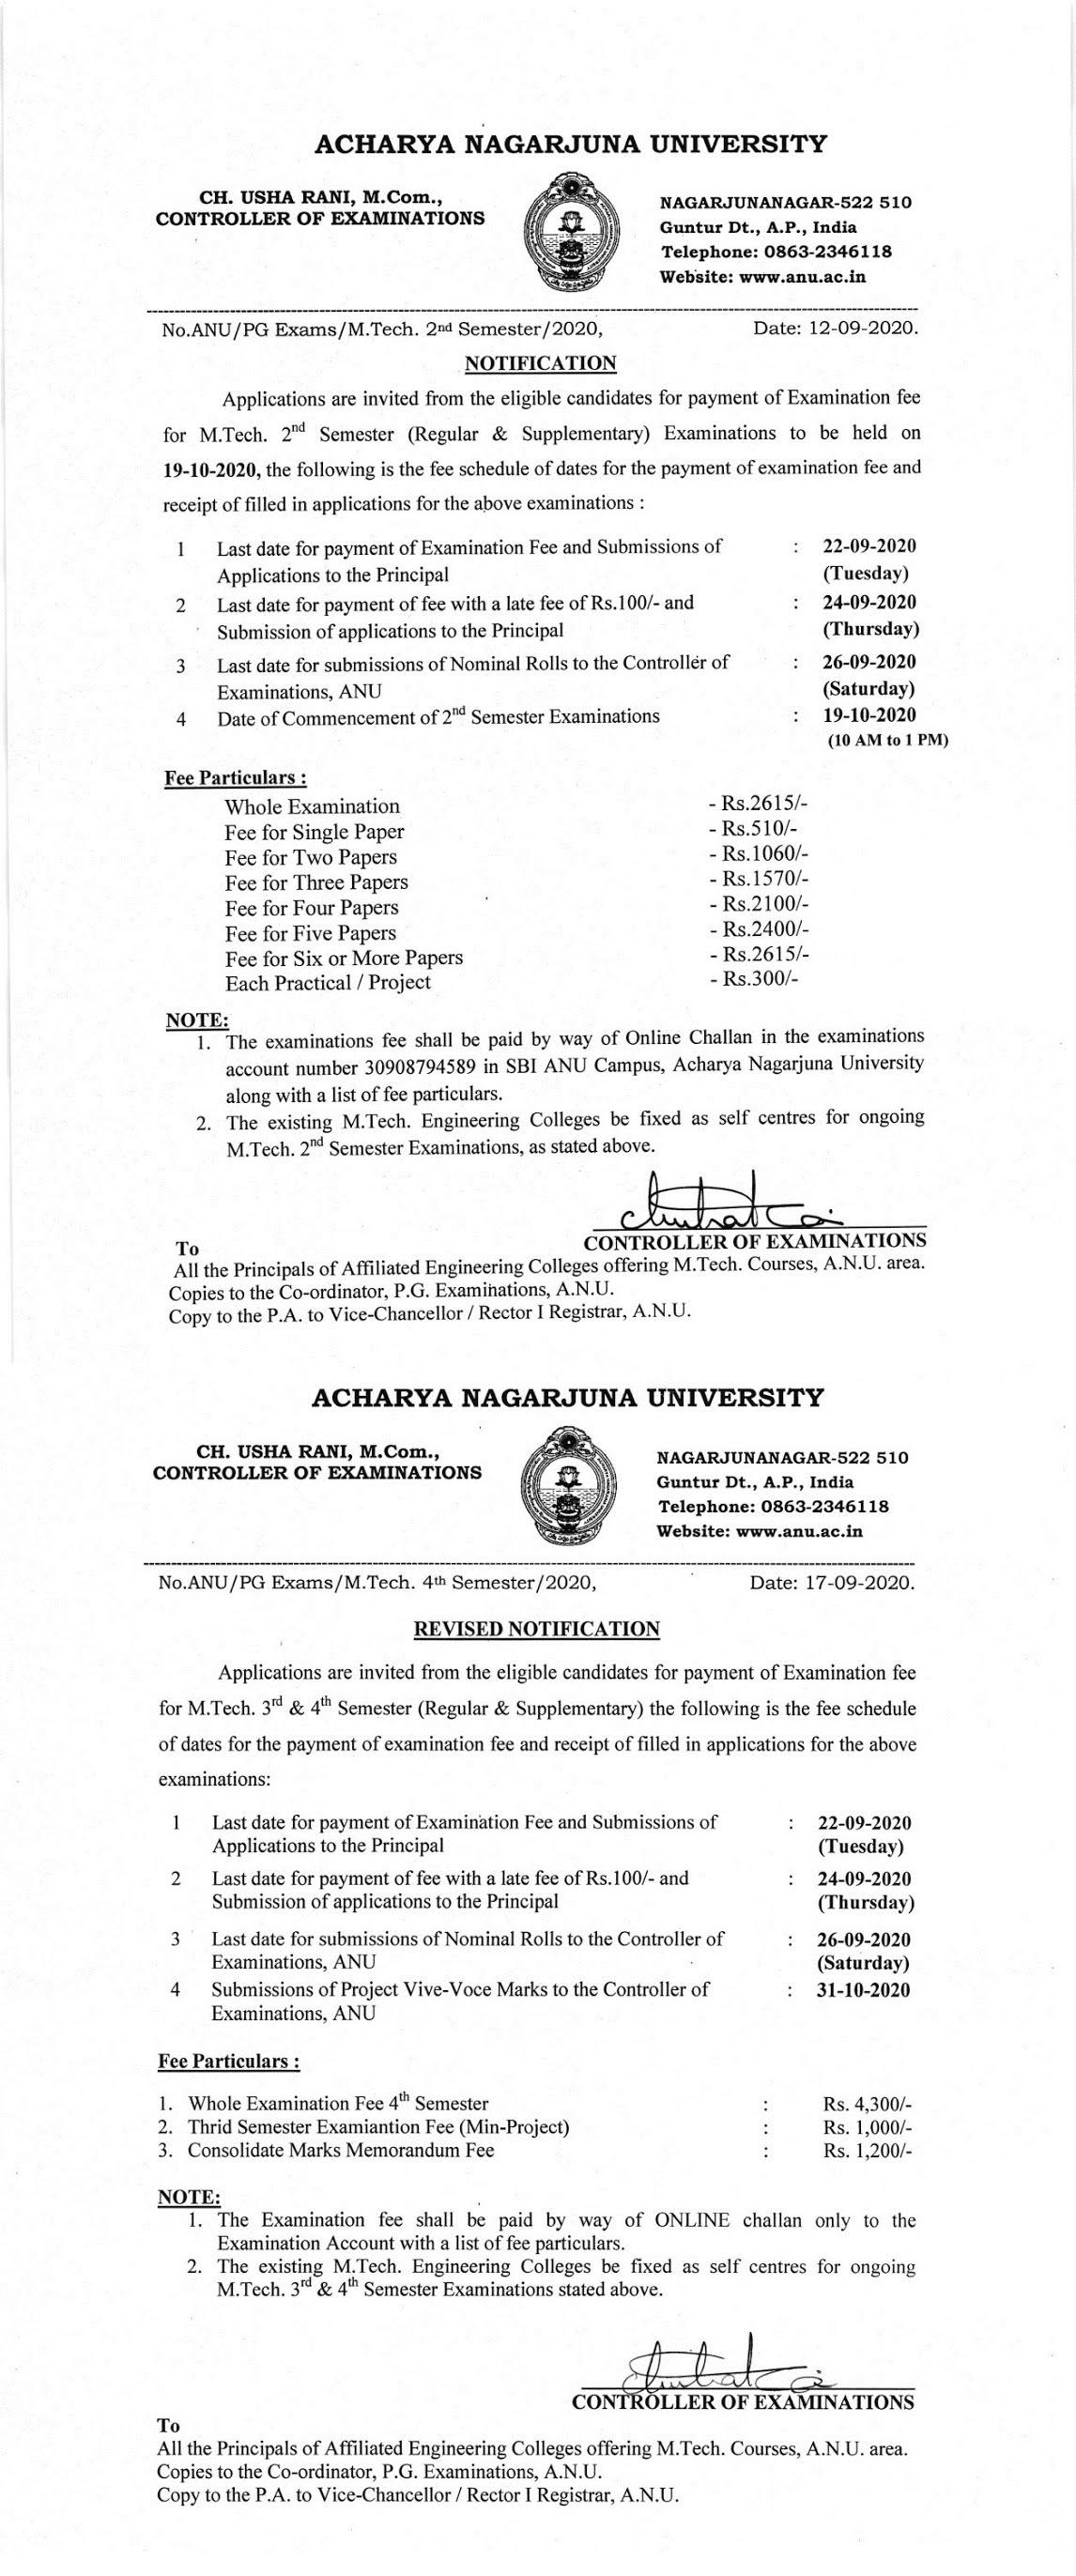 Acharya Nagarjuna University M.Tech 2nd,3rd & 4th Sem Sep 2020 Exam Fee Notification